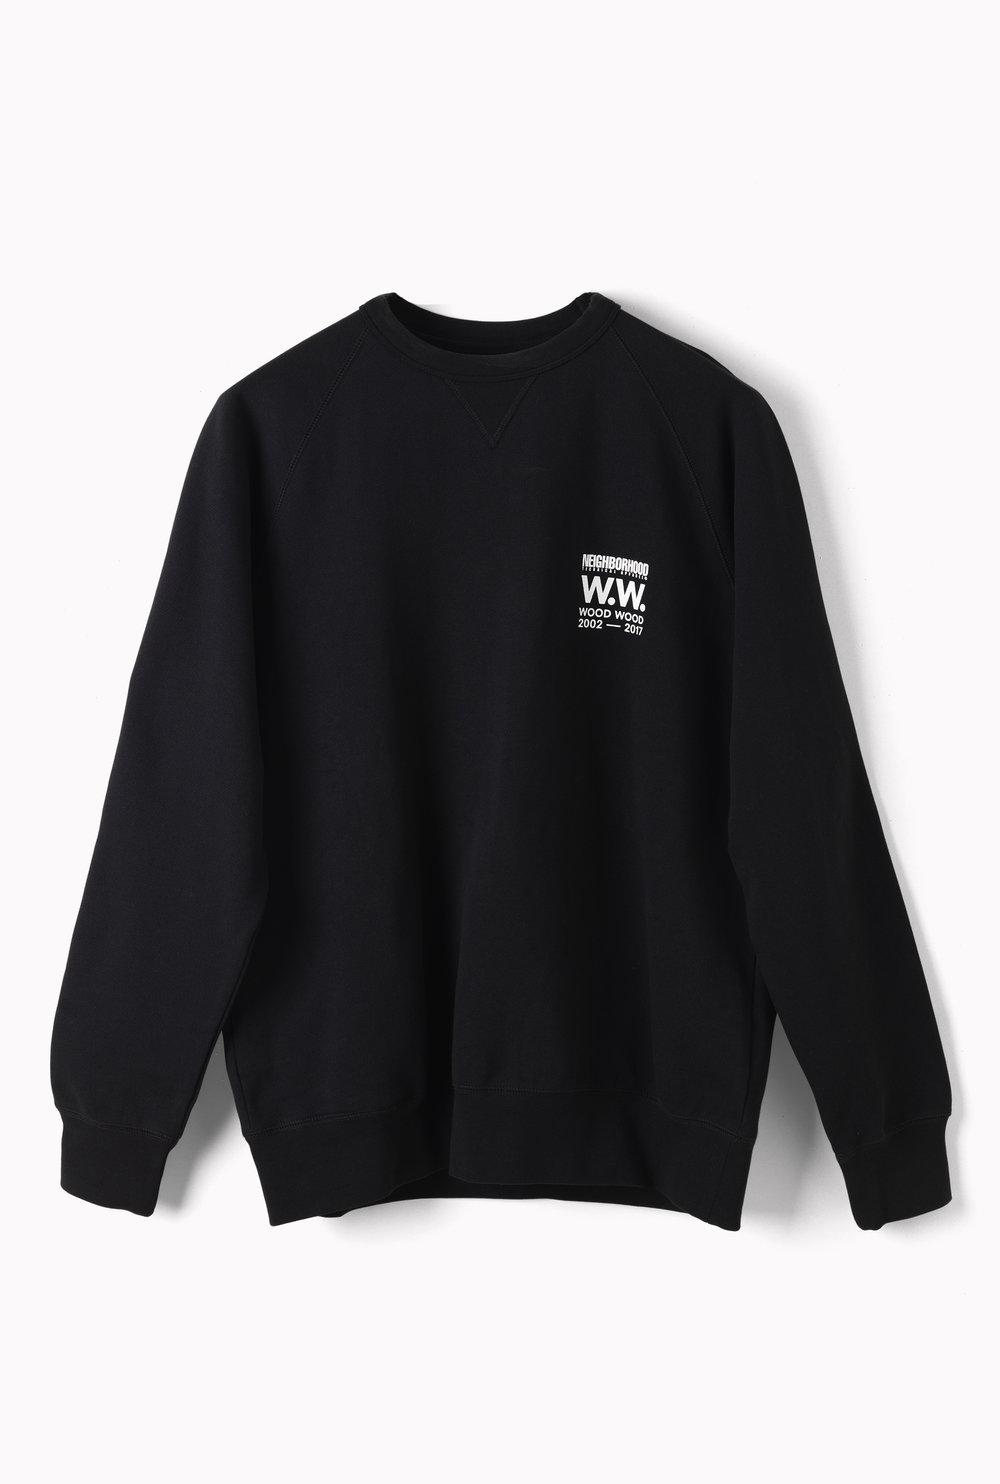 WoodWood_Hester sweatshirt_Black.jpg